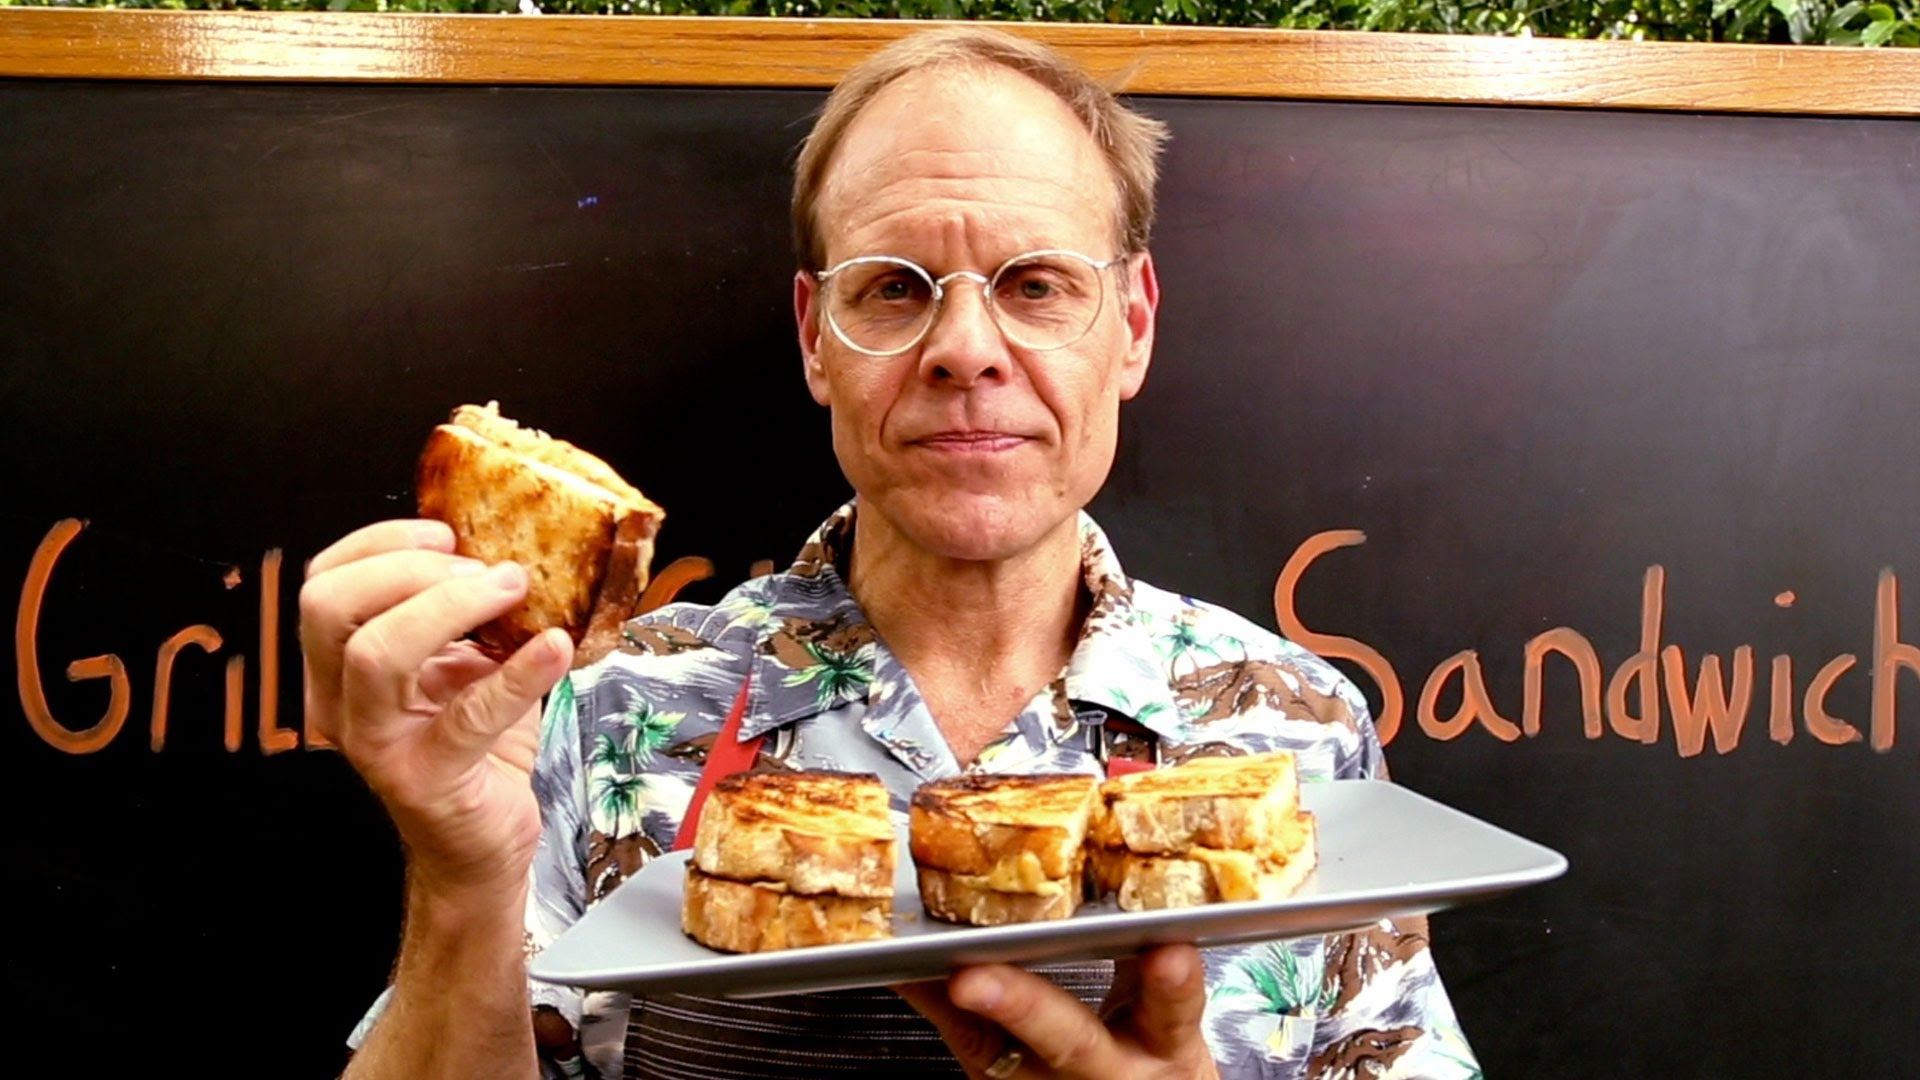 Food Expert Alton Browns Four List Diet Plan pics